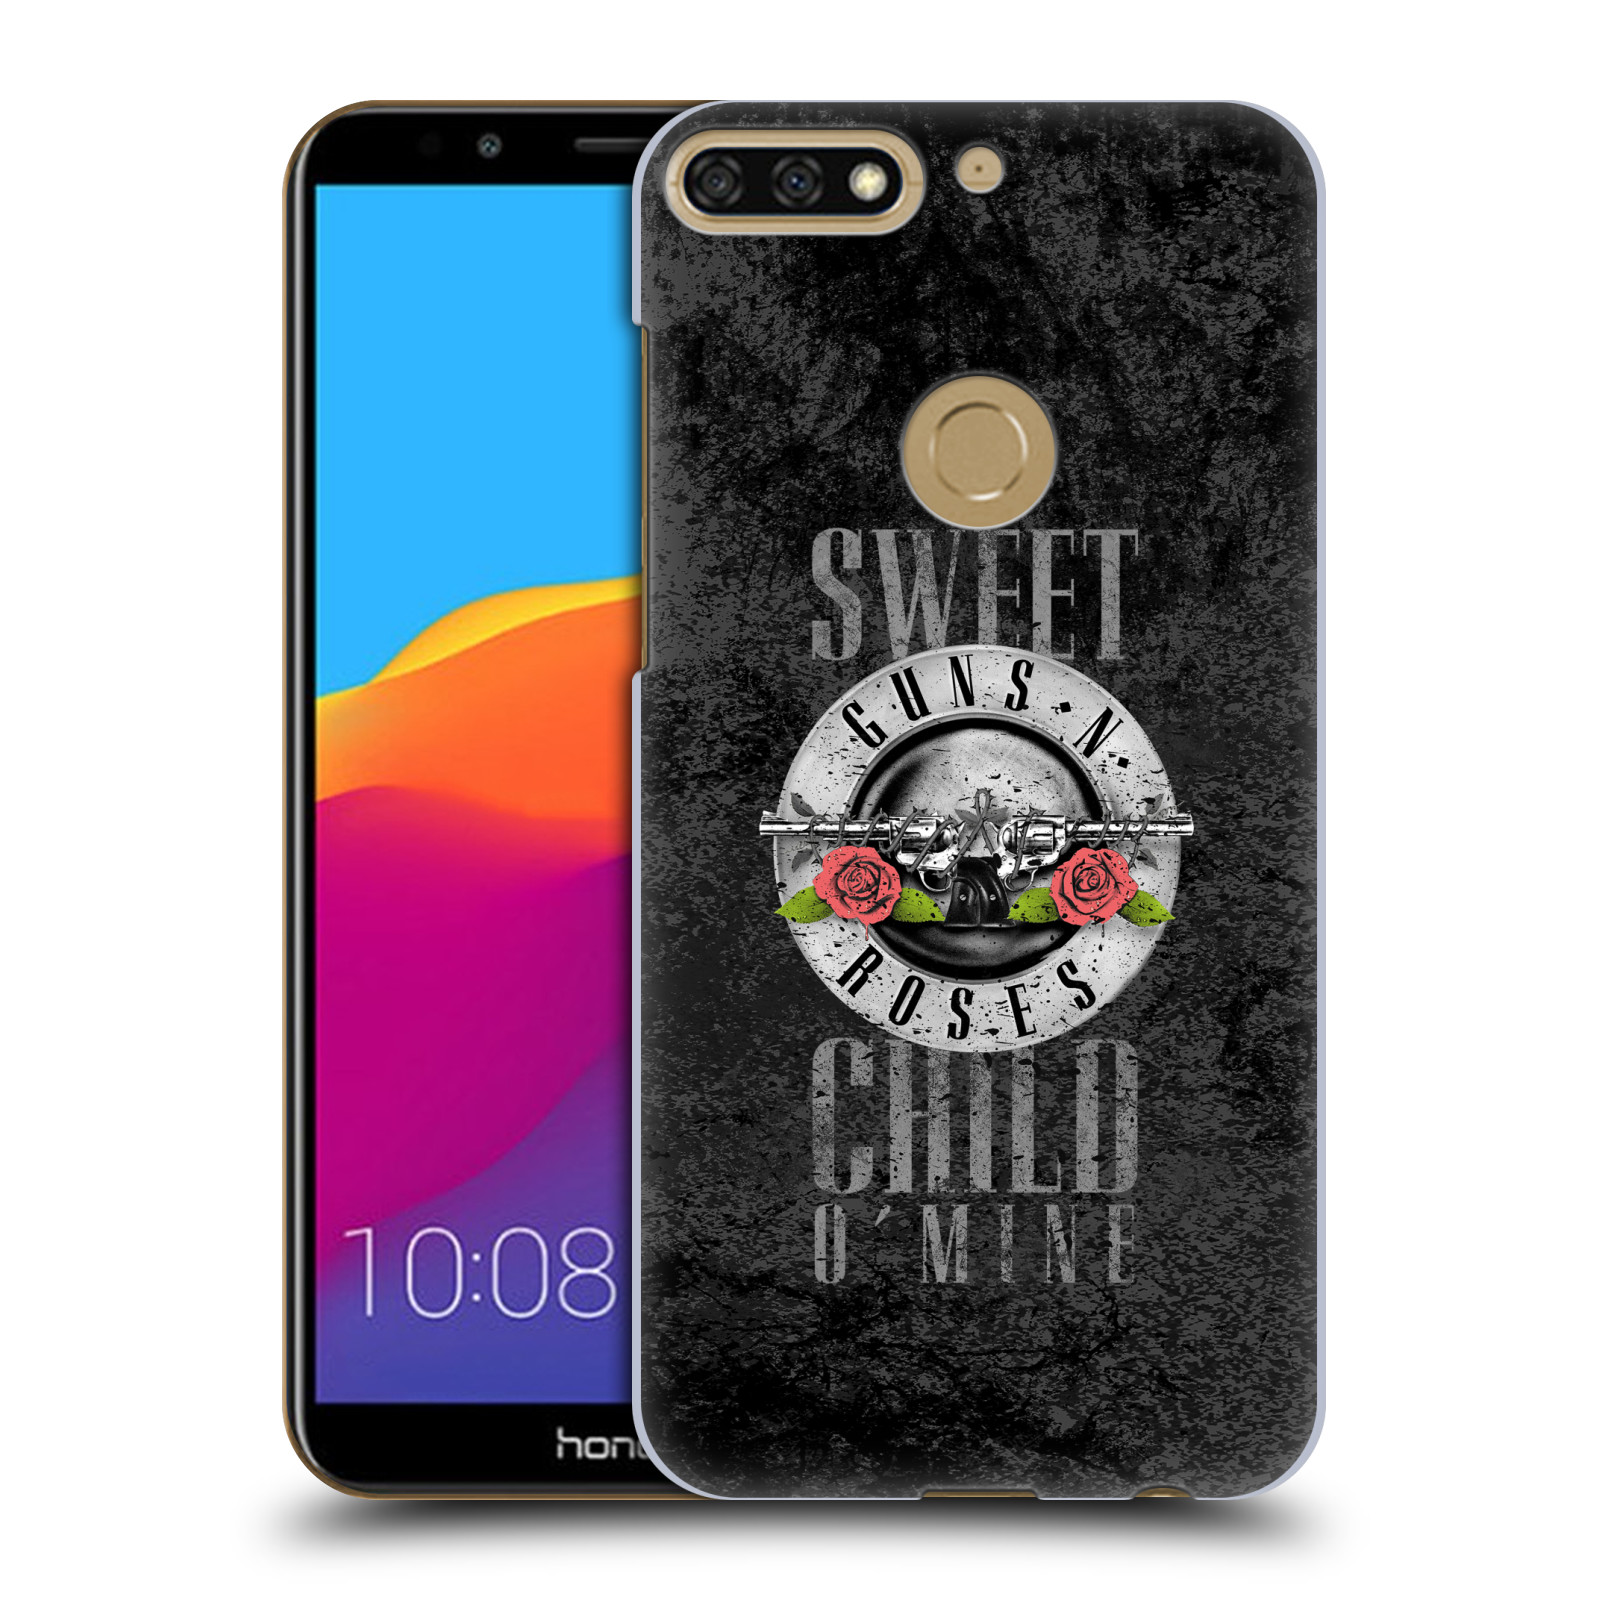 Plastové pouzdro na mobil Huawei Y7 Prime 2018 - Head Case - Guns N' Roses - Sweet Child